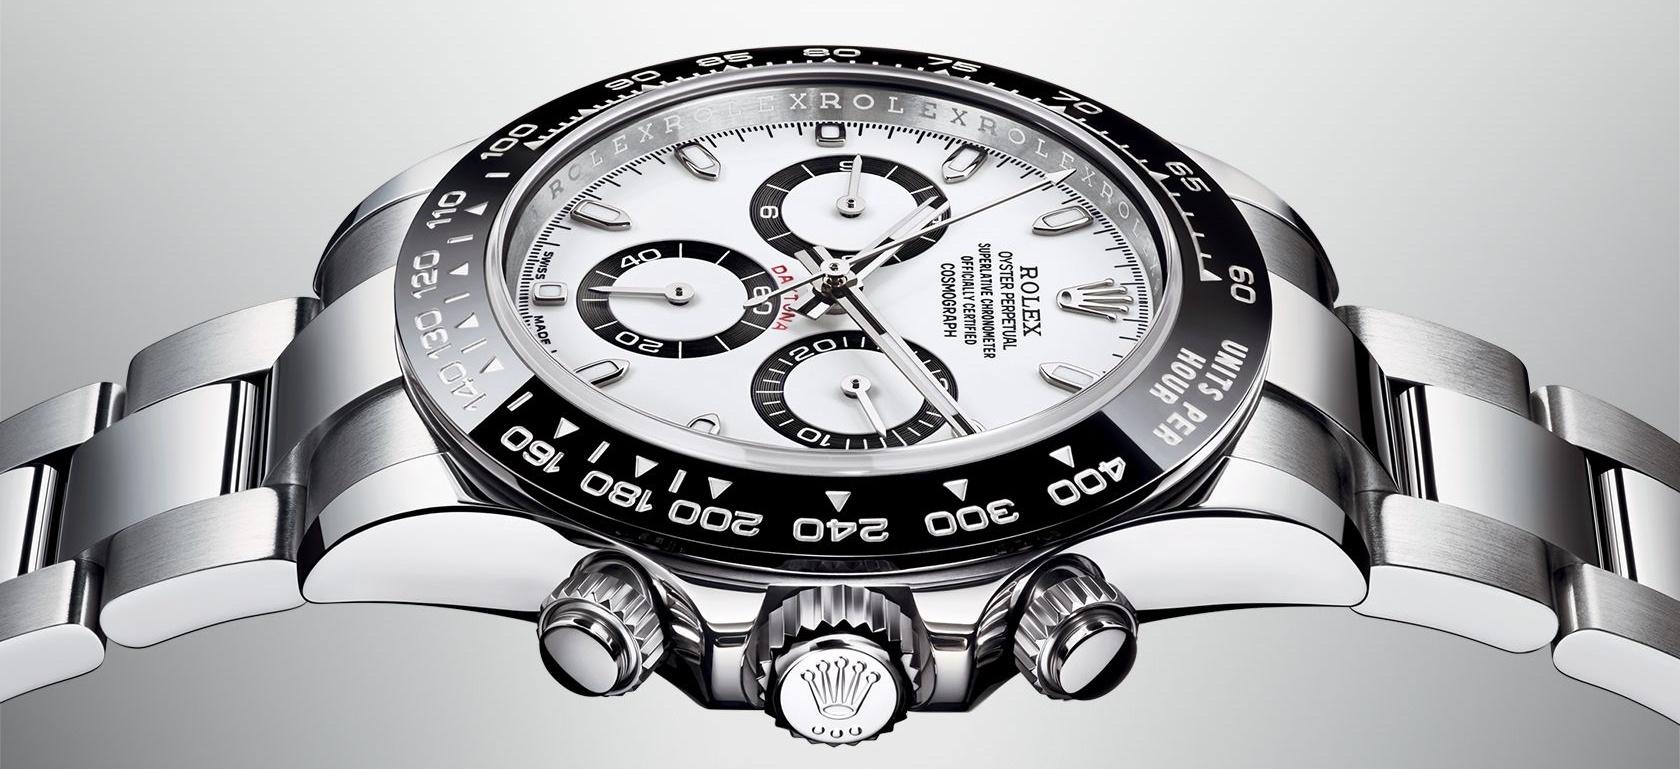 Baselworld 2016: Rolex Cosmograph Daytona Watch